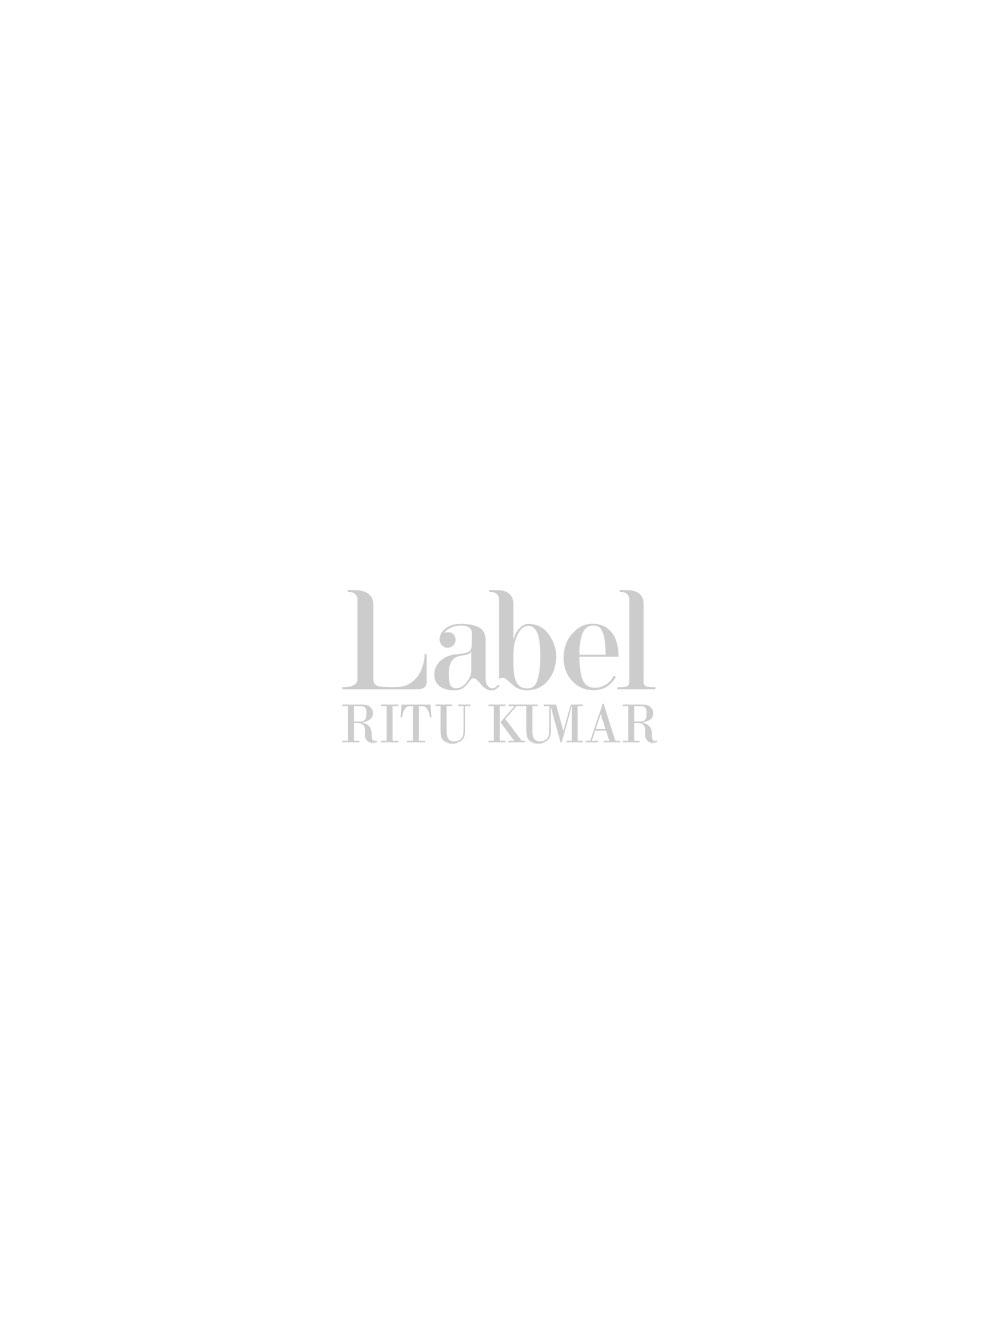 Designer Floral Printed Bell Skirt By Label Ritu Kumar